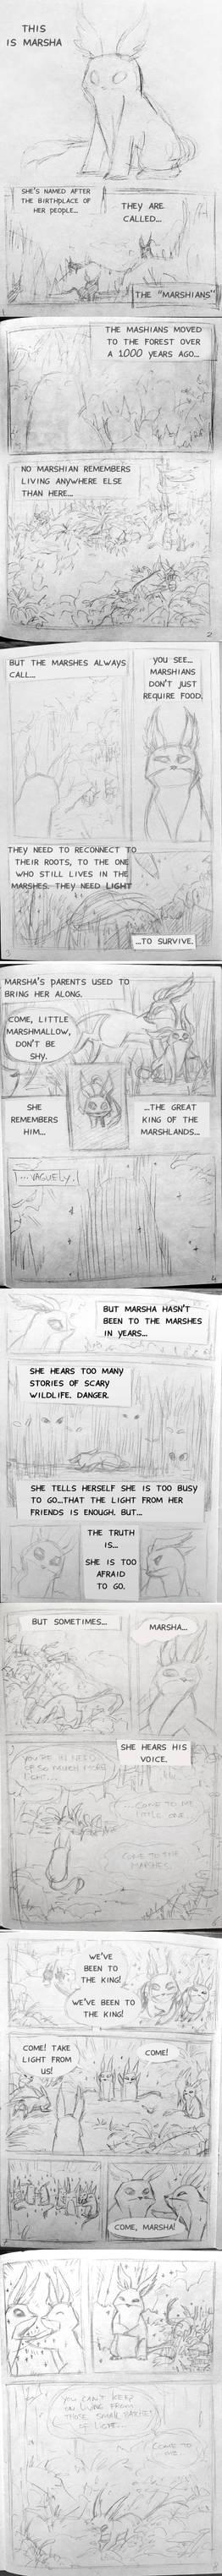 The Marshians 1 - 24 Hour Comic Day 2019